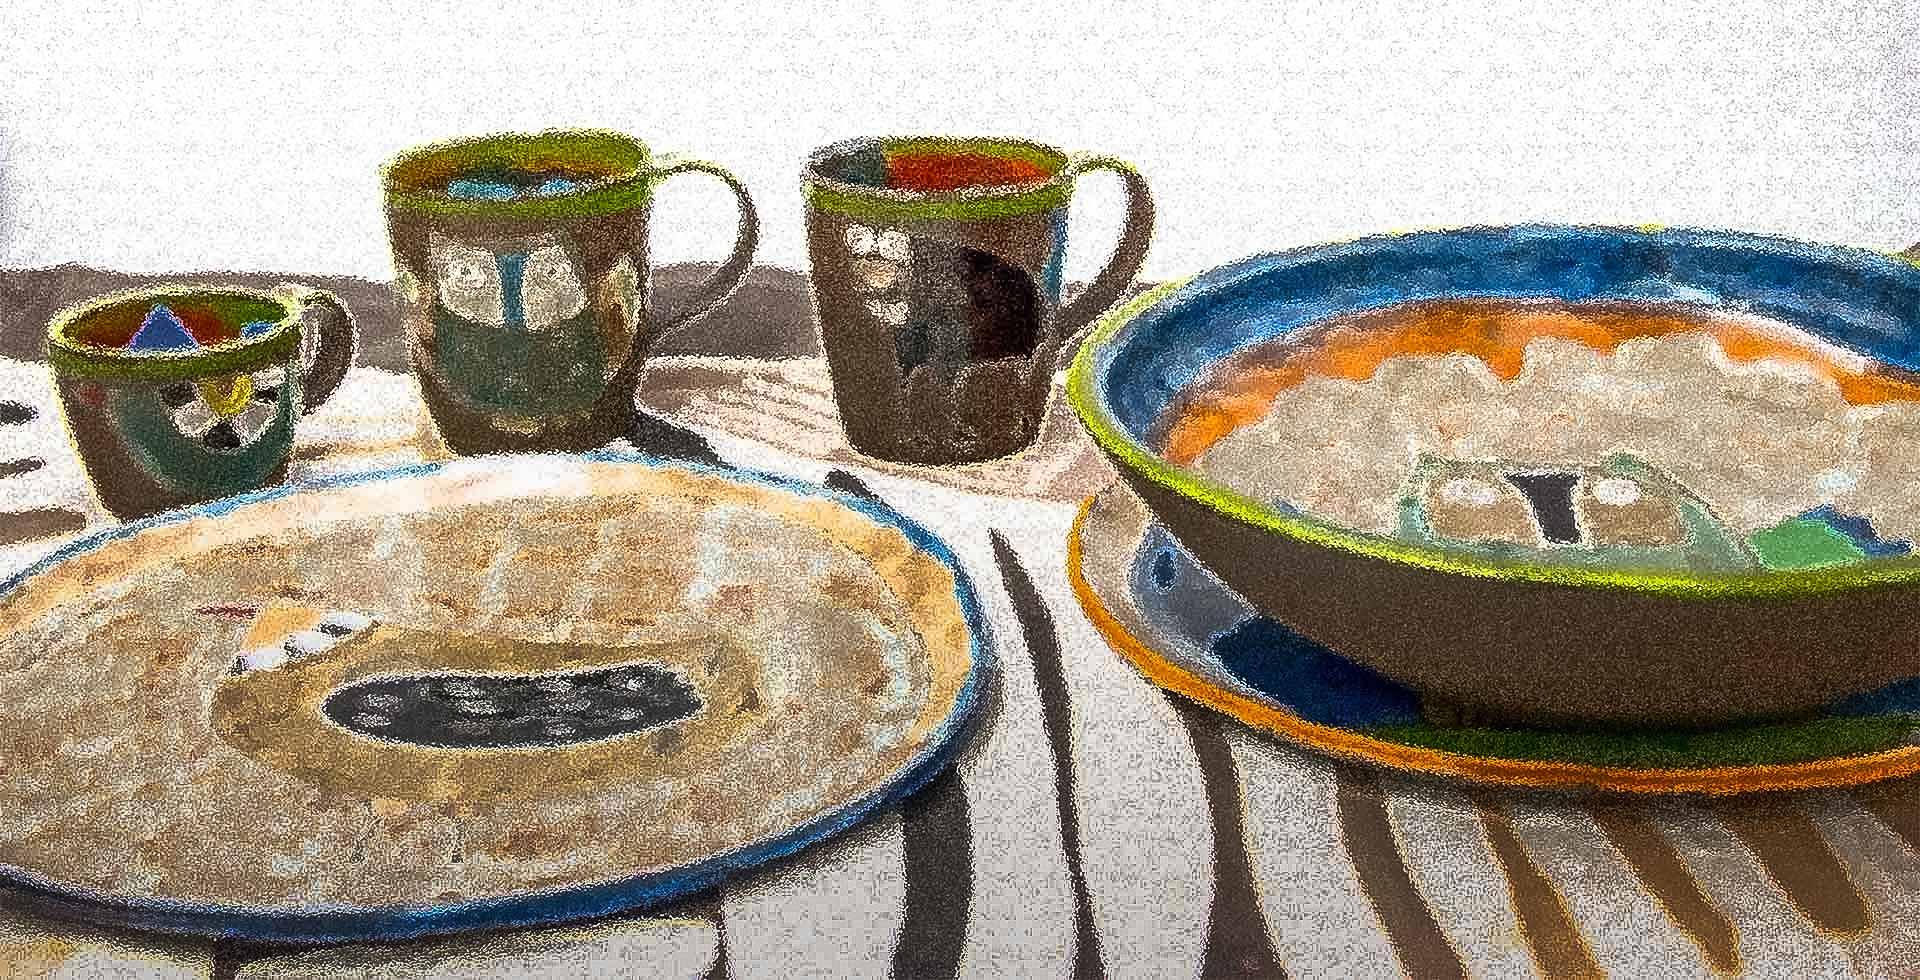 Handmade Polish pottery shop